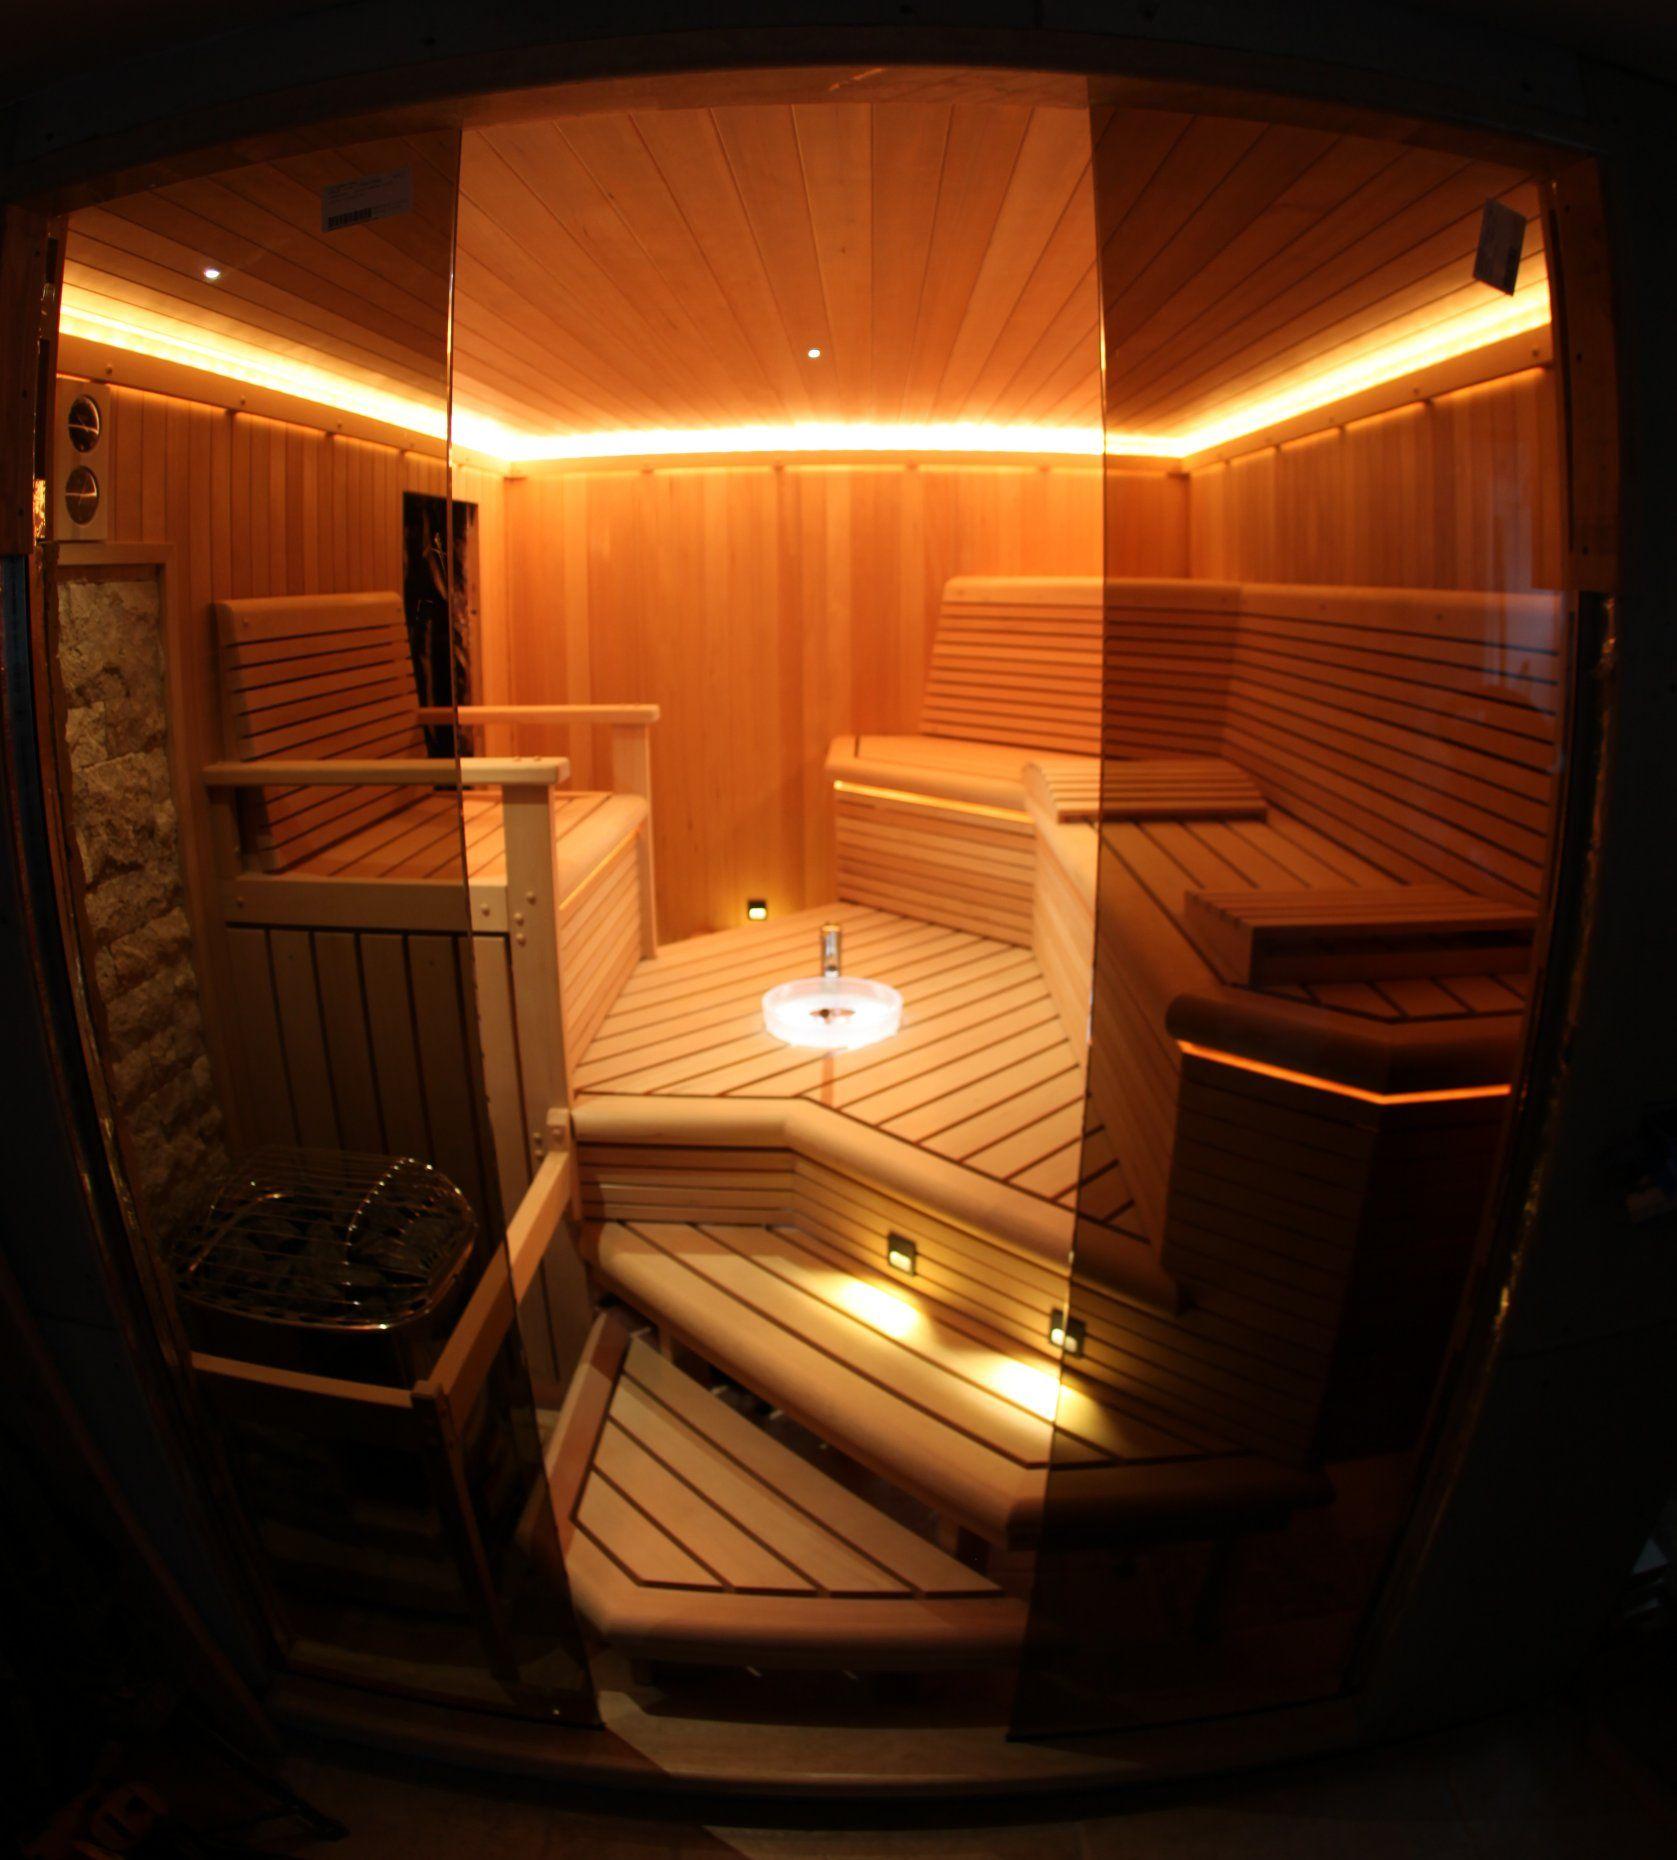 Custom Sauna On Staten Island, With Custom Lighting, Sink